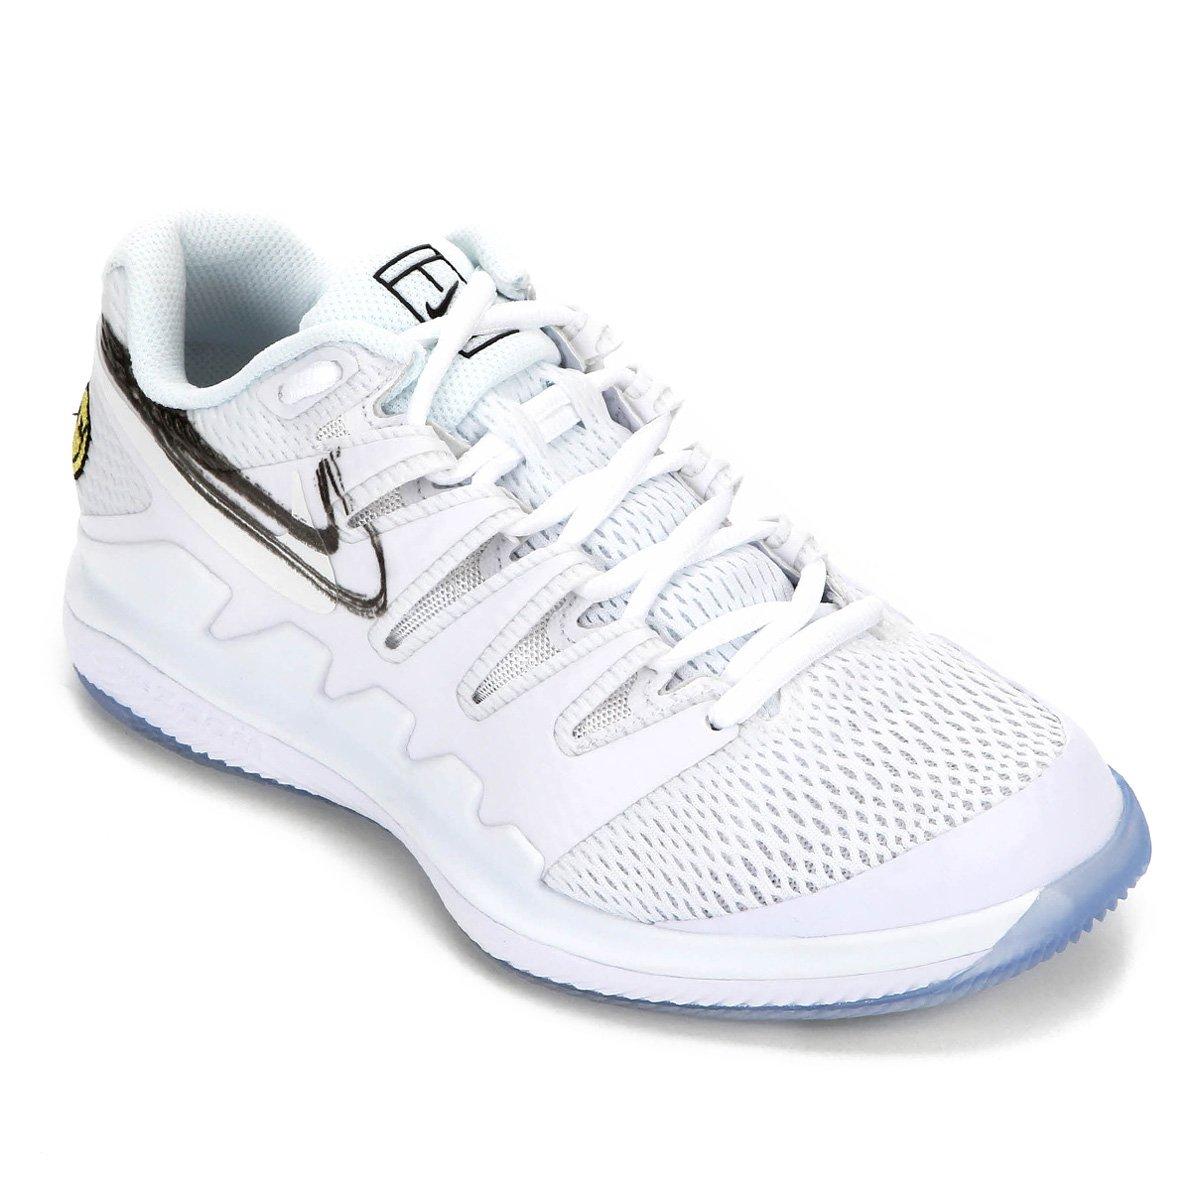 Tênis Nike Air Zoom Vapor X Feminino Branco E Preto